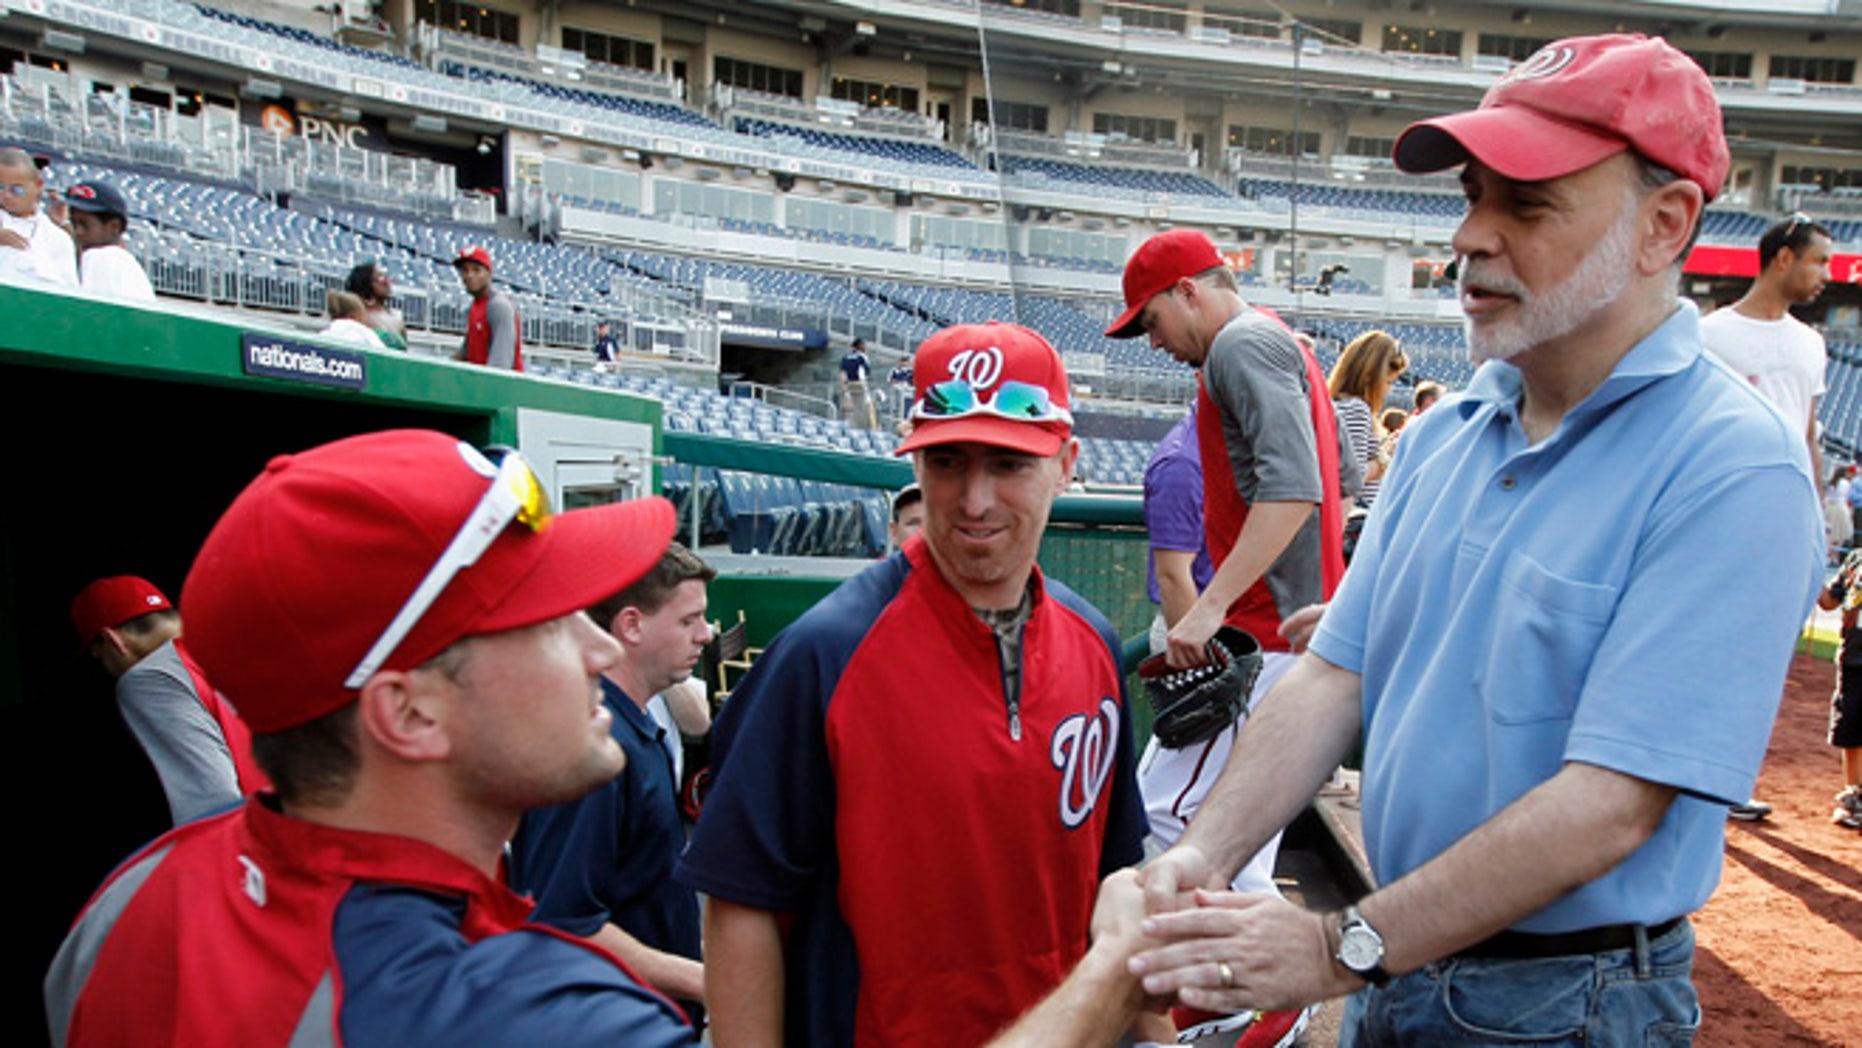 Washington Nationals third baseman Ryan Zimmerman, left, and first baseman Adam LaRoche, center, greeting Federal Reserve Board Chairman Ben Bernanke before a baseball game against the Miami Marlins at Nationals Park in Washington.